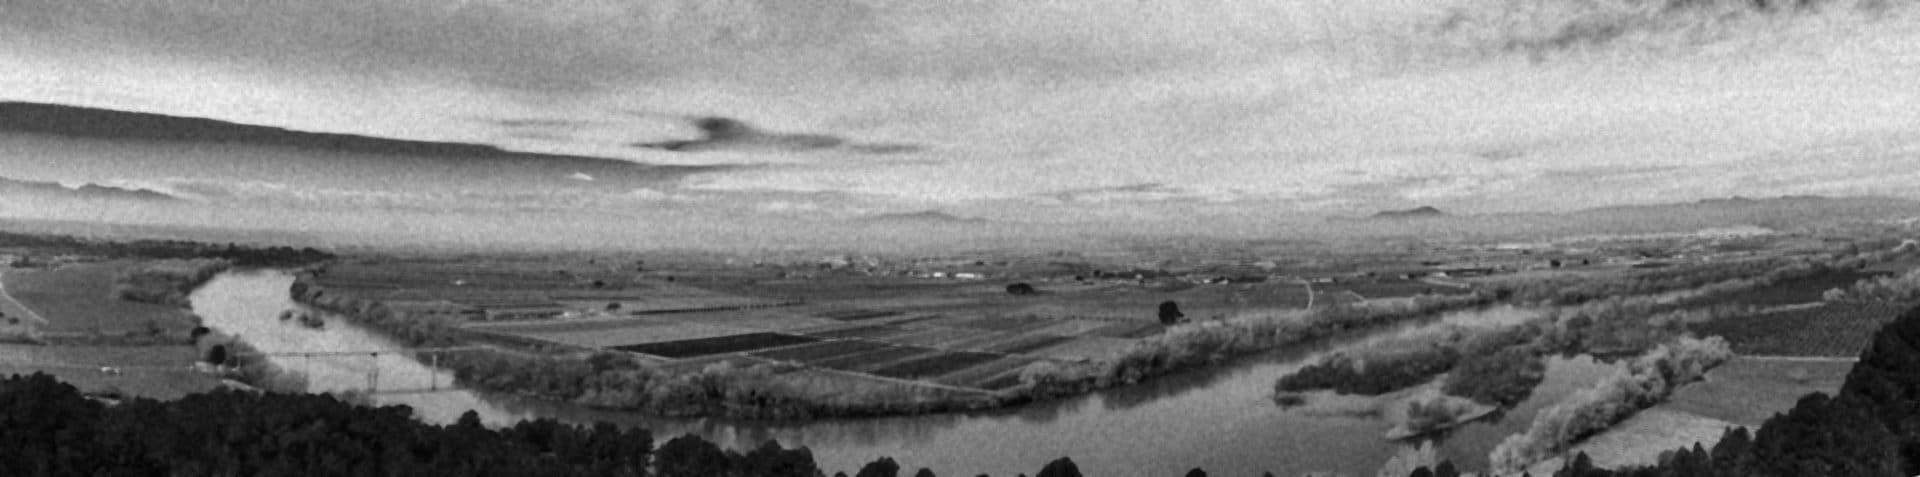 Ebro AdobeStock 195786053bn 5